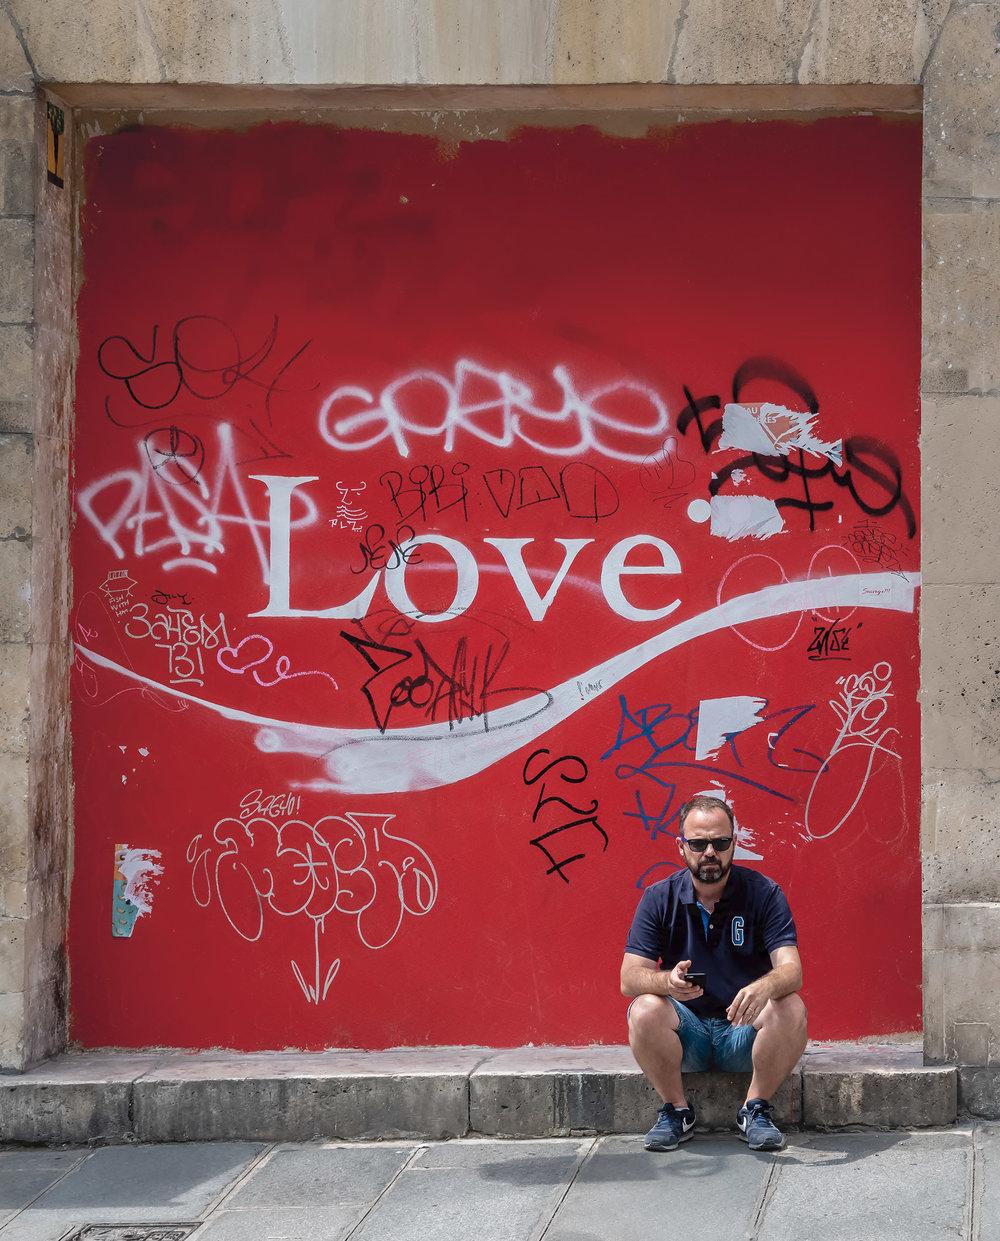 Love_grafiti1982.jpg